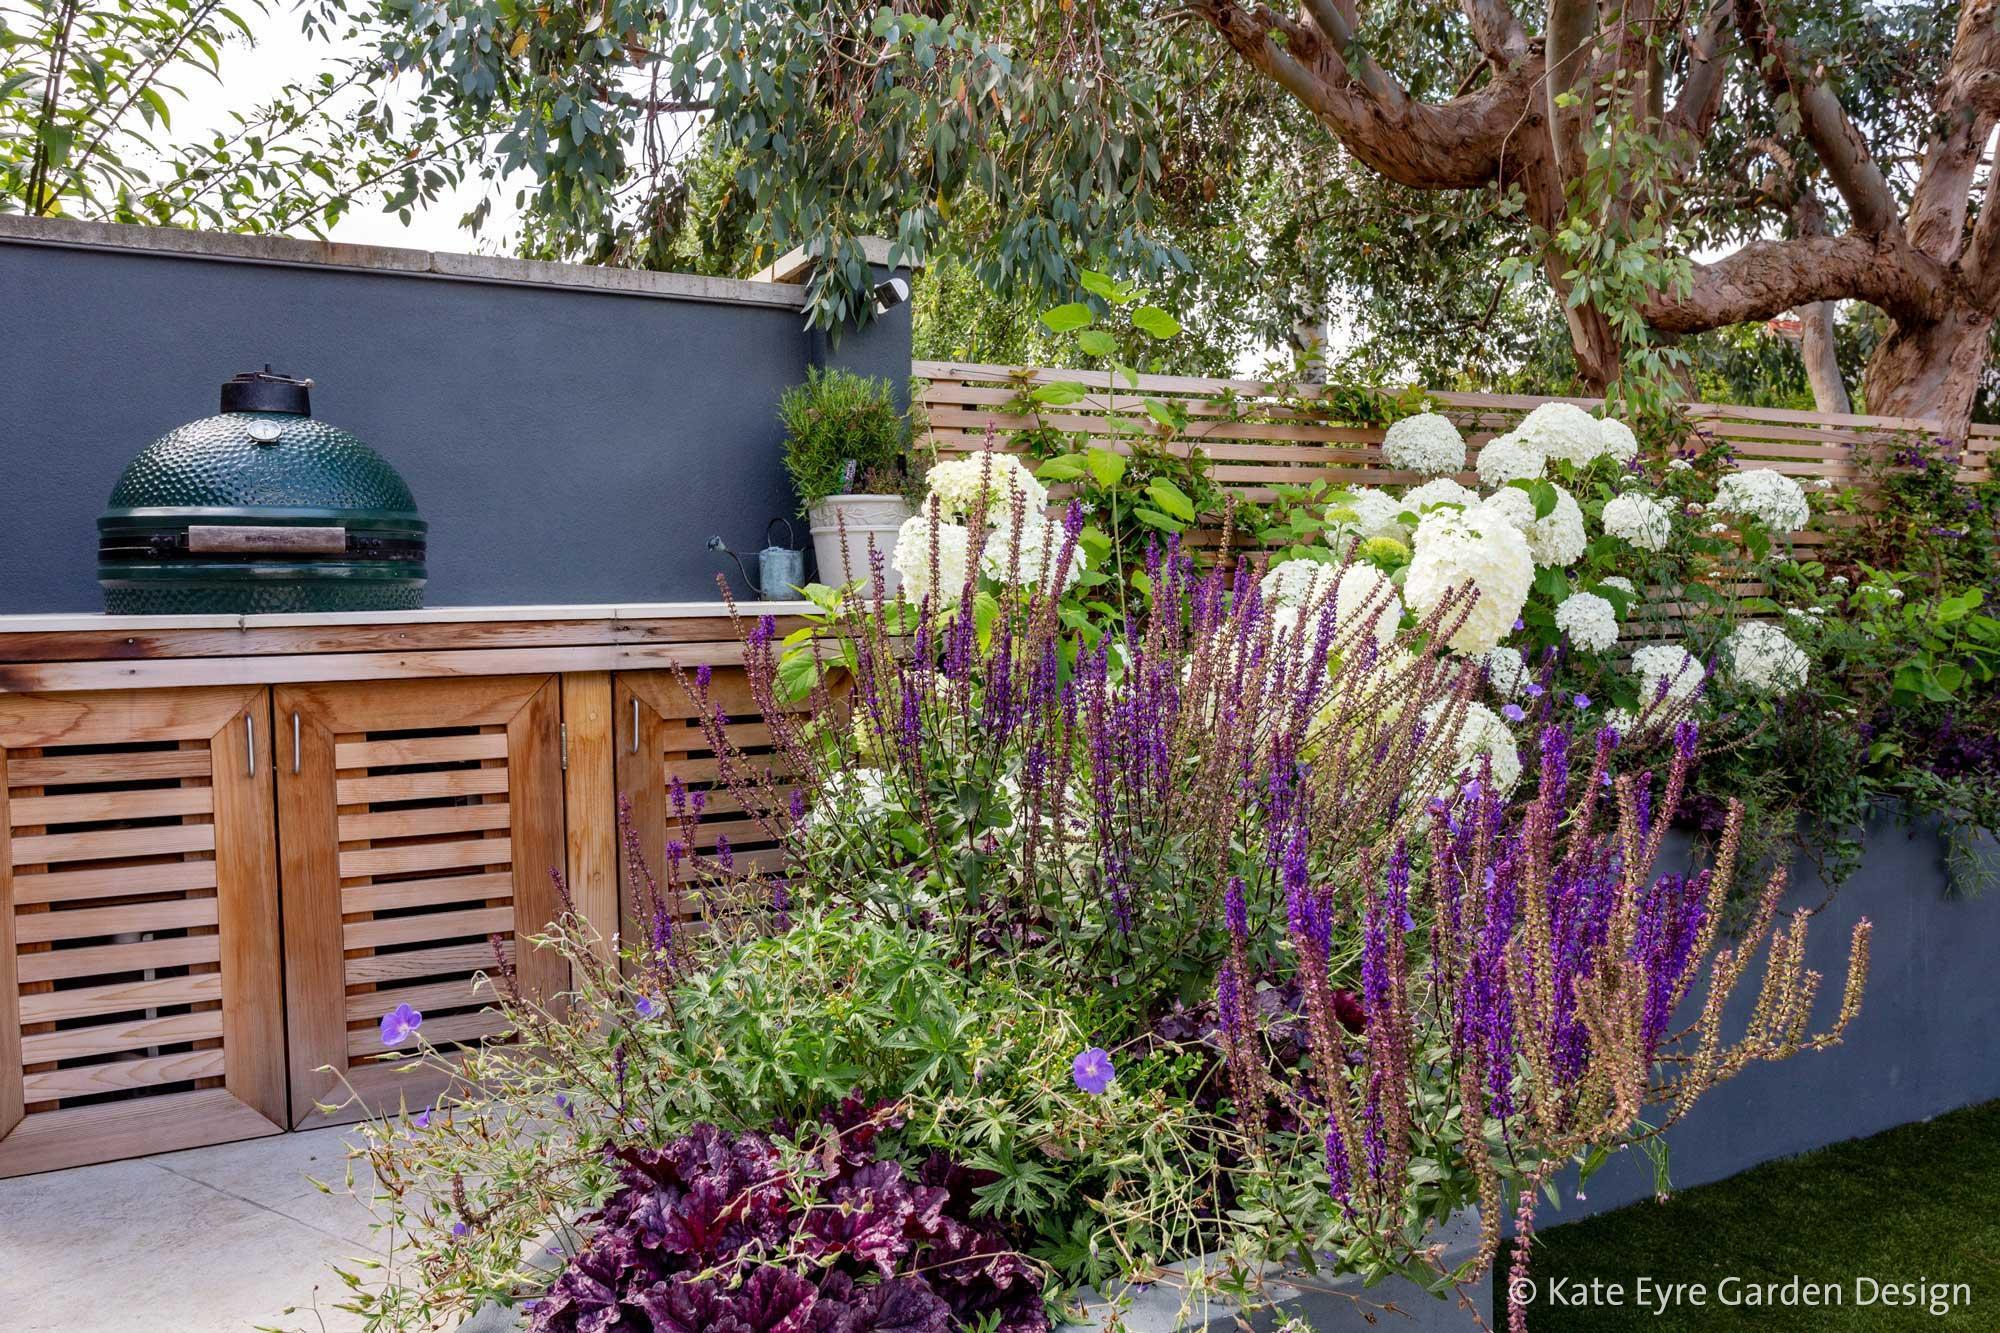 Ildersly Grove 2: raised planter & outdoor kitchen